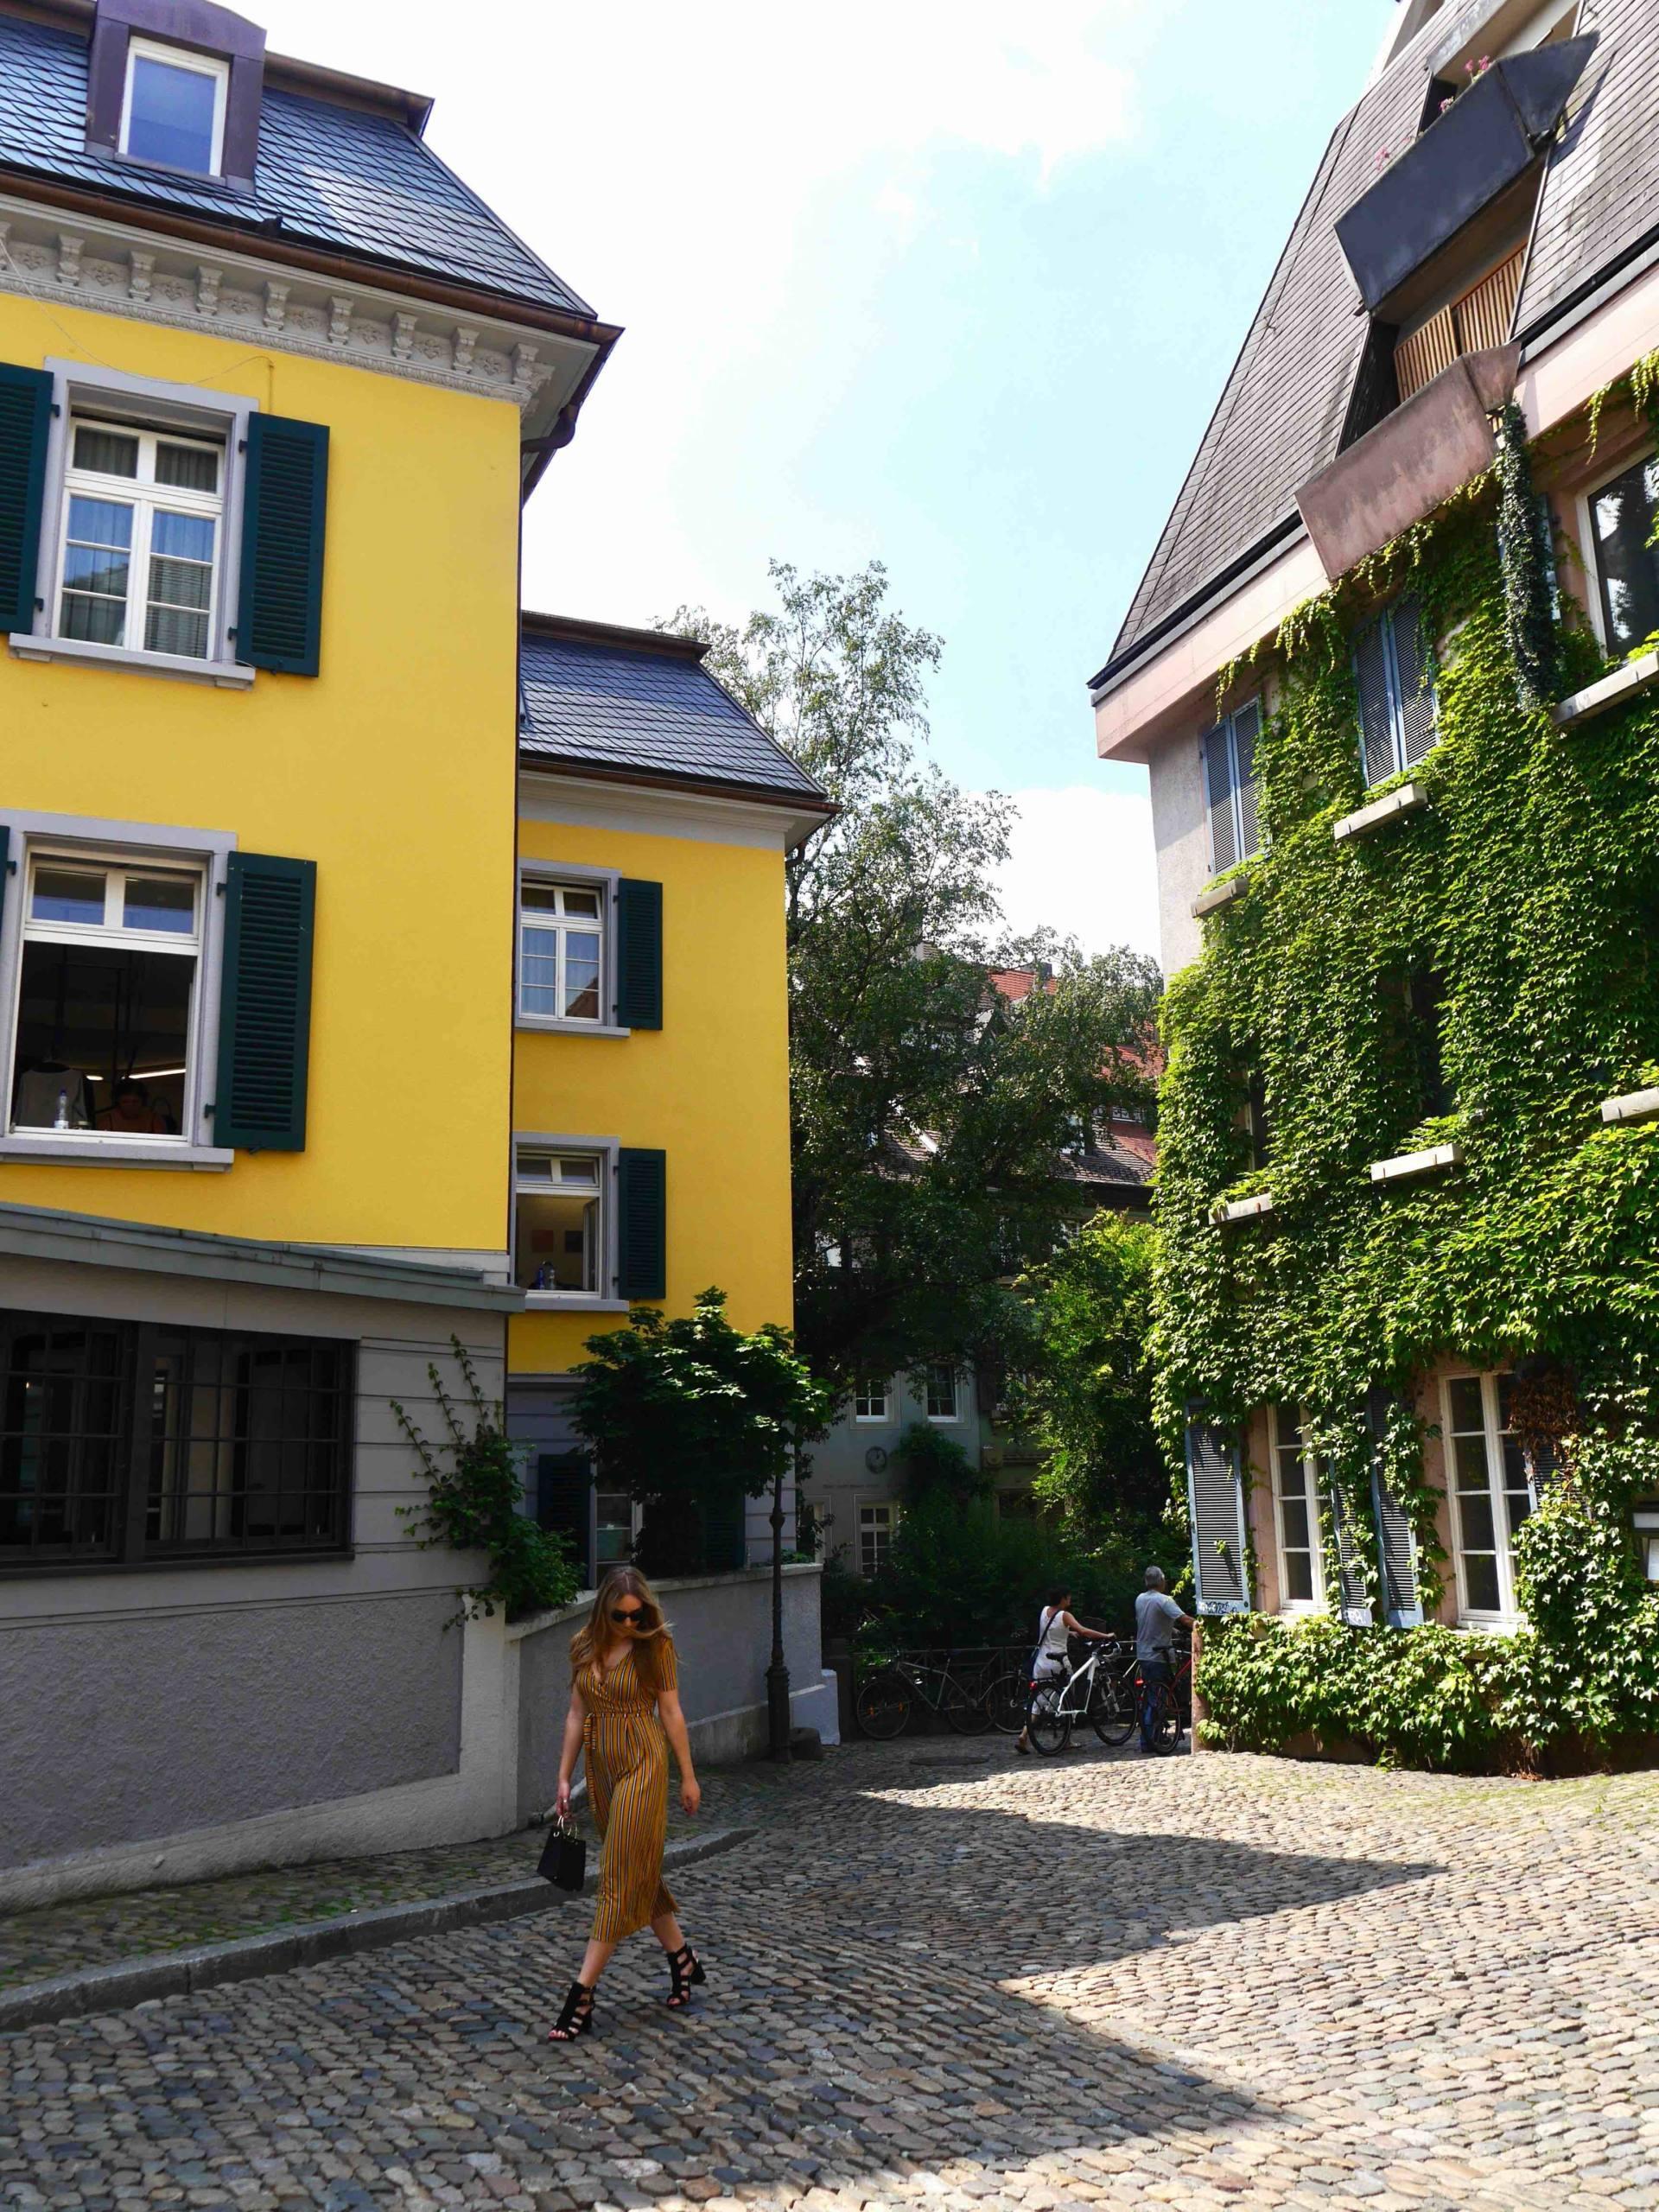 Gerberau Freiburg | Instagrammable Places in Freiburg